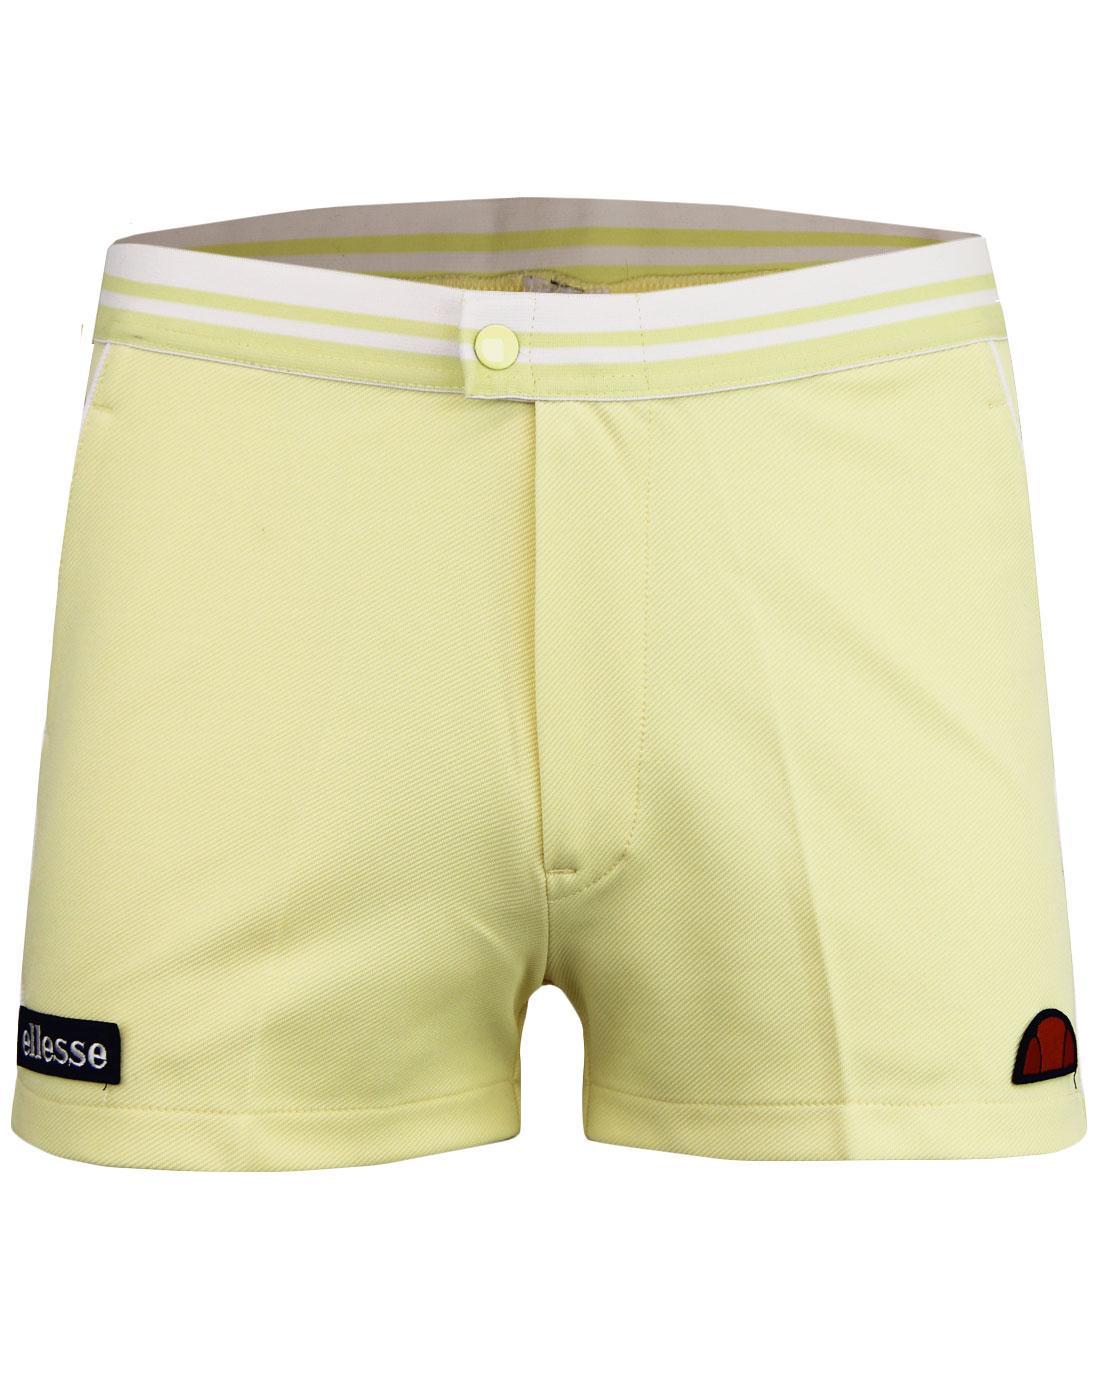 Tortoreto ELLESSE Retro 1980s Tennis Shorts (TY)